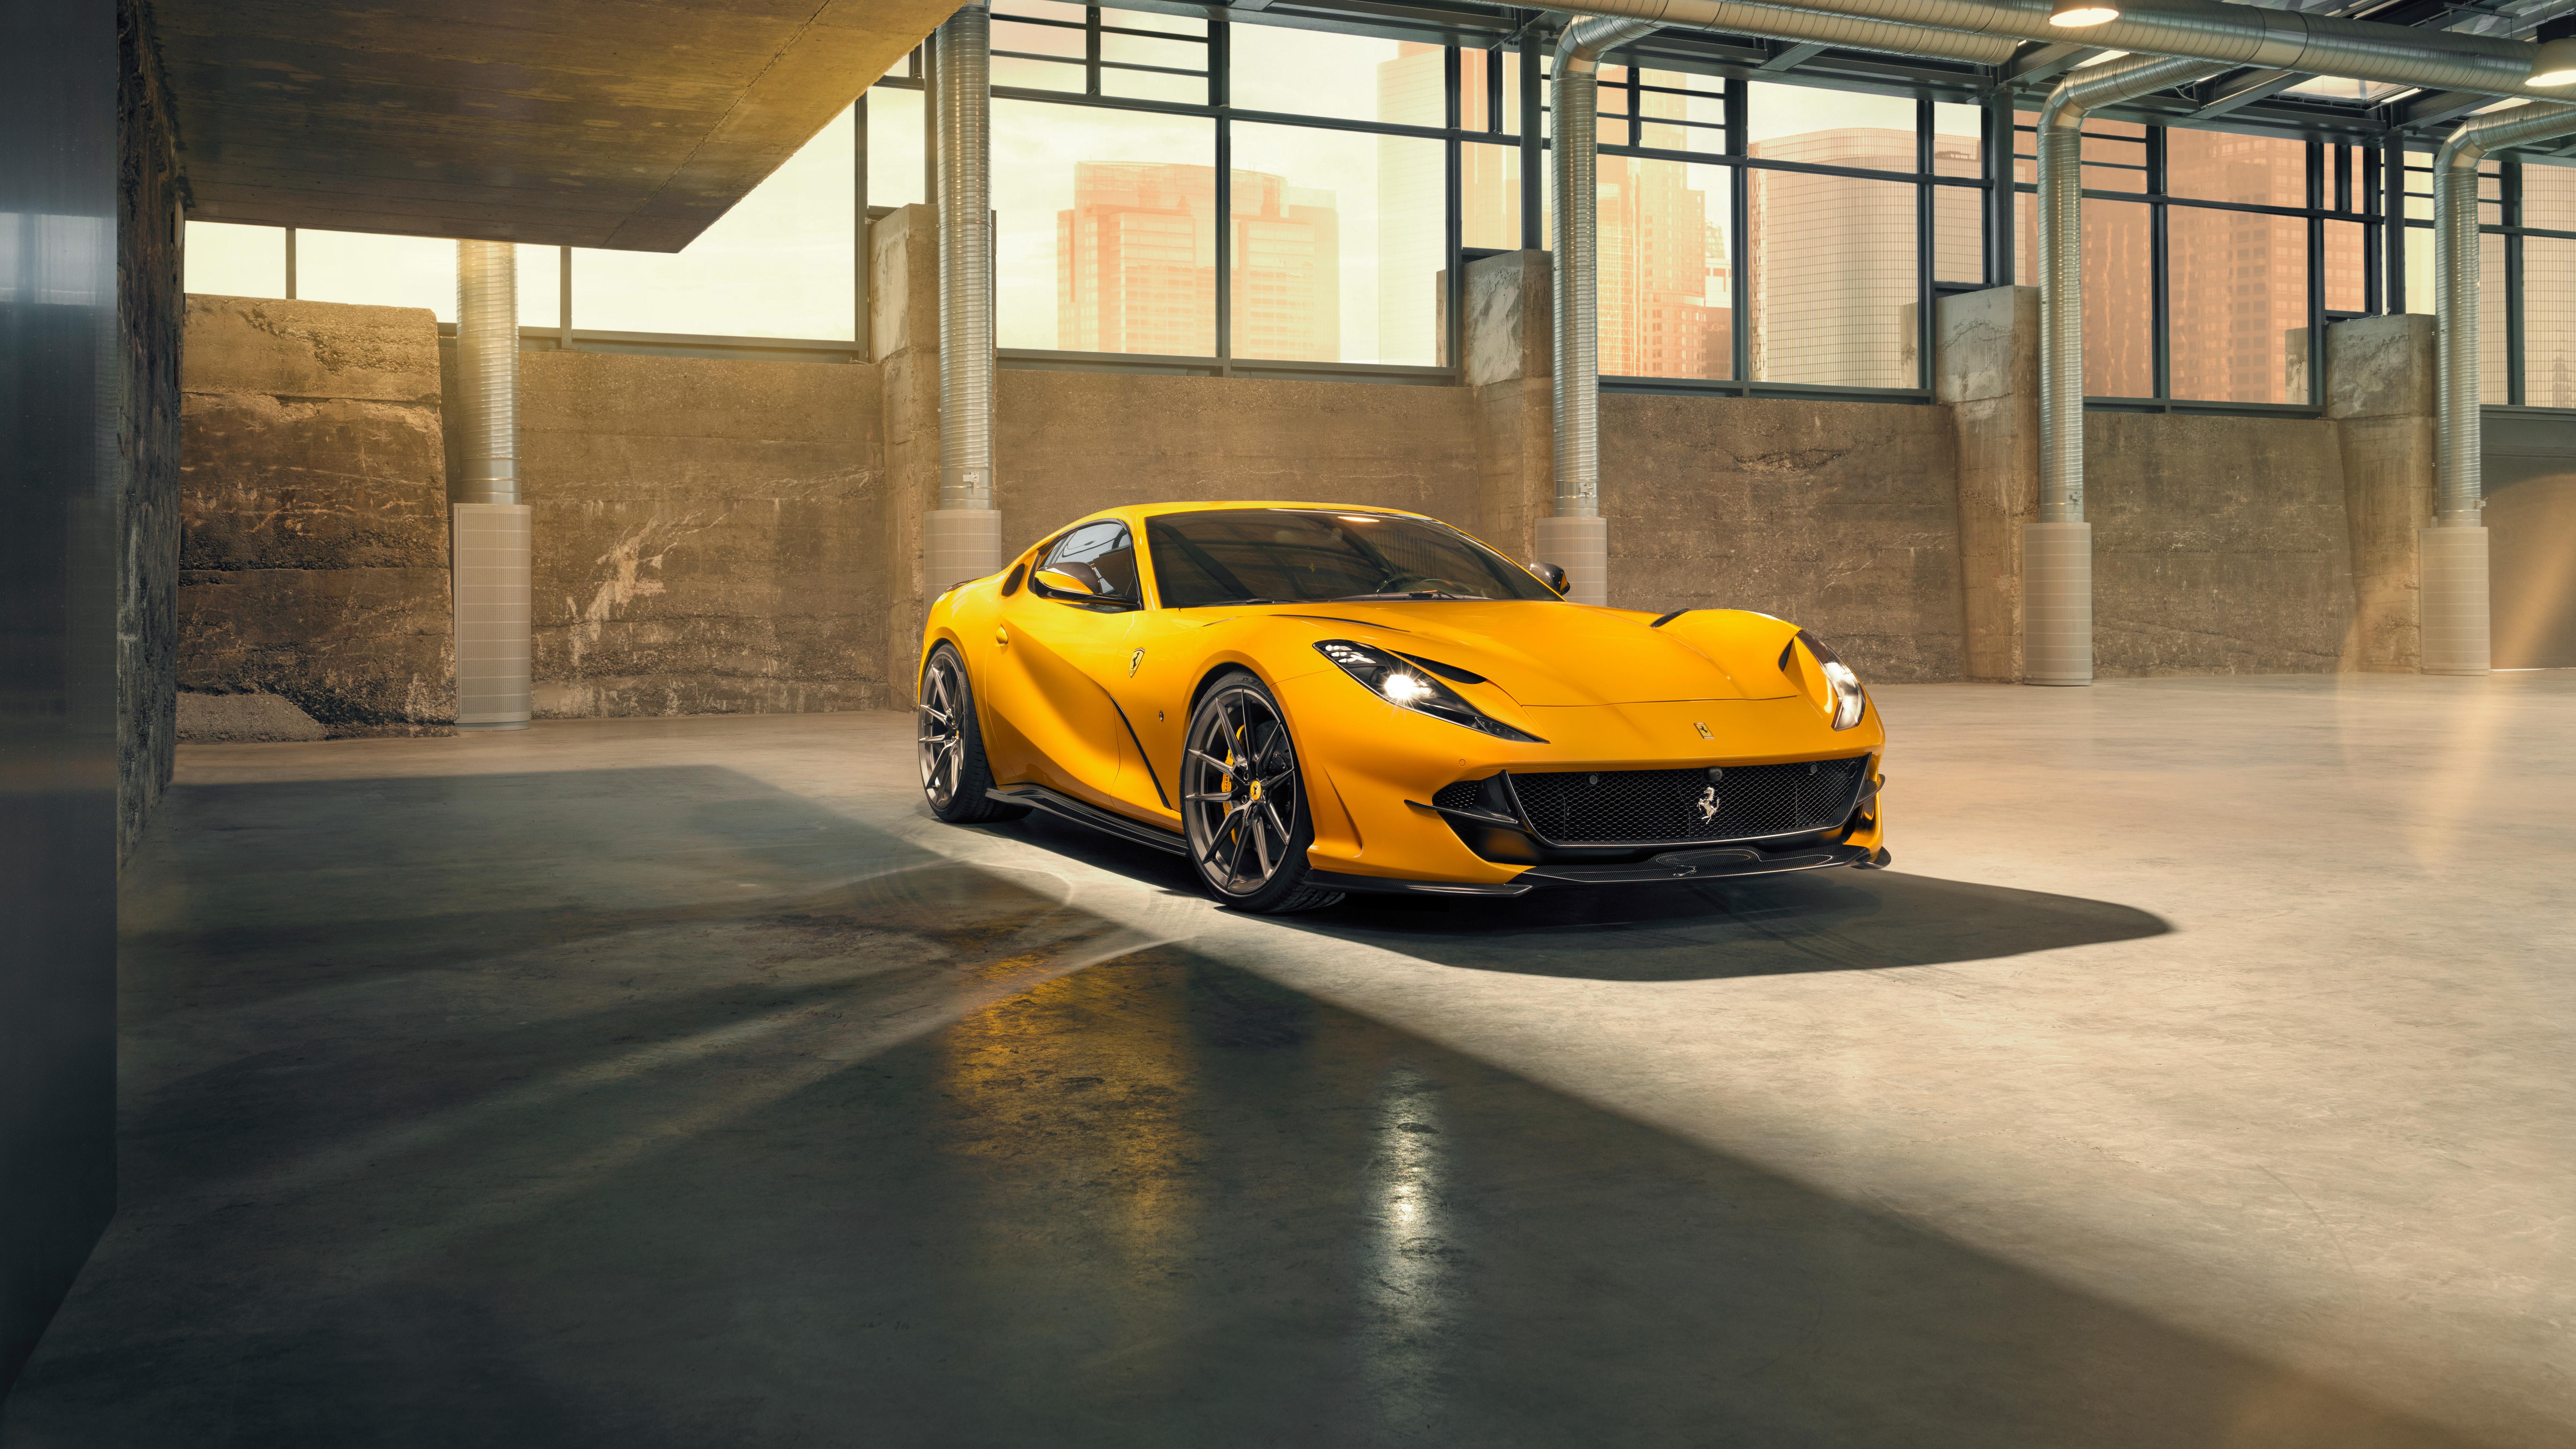 Novitec Ferrari 812 Superfast 2019 4K 8K 6 Wallpaper HD Car 7680x4320